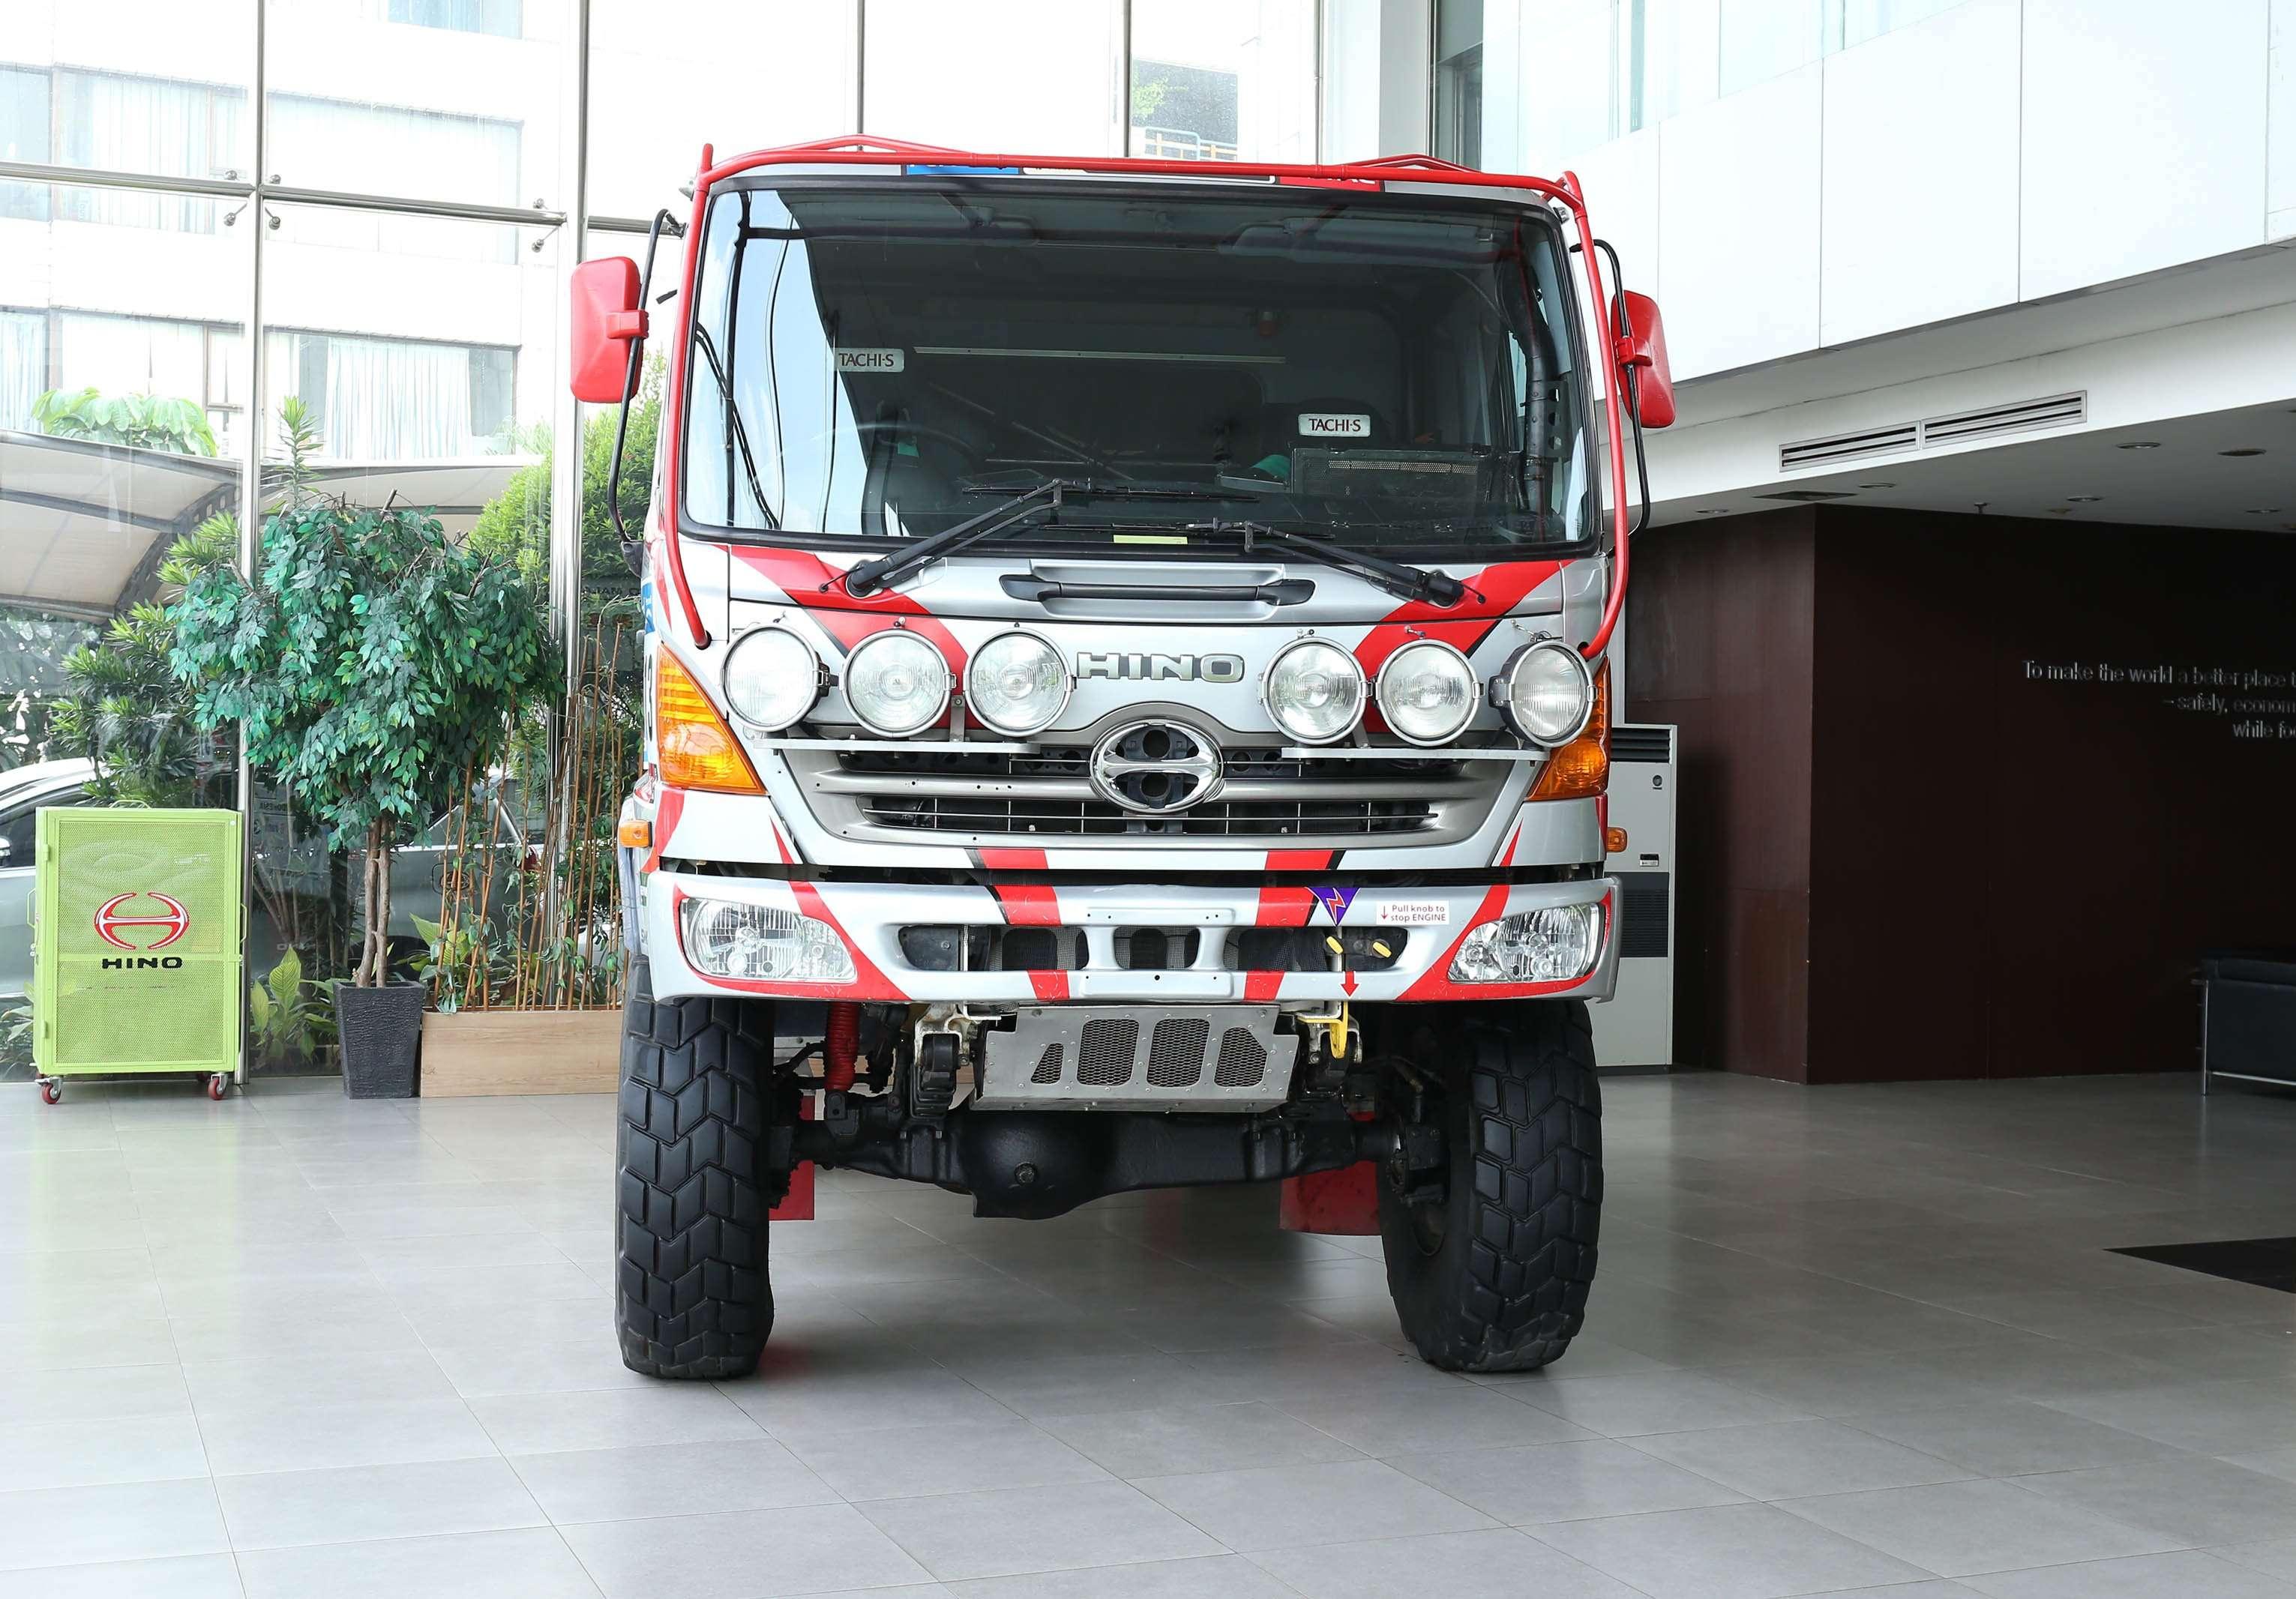 Kenalkan Ketangguhan, Hino Rally Dakar Mejeng di Indonesia